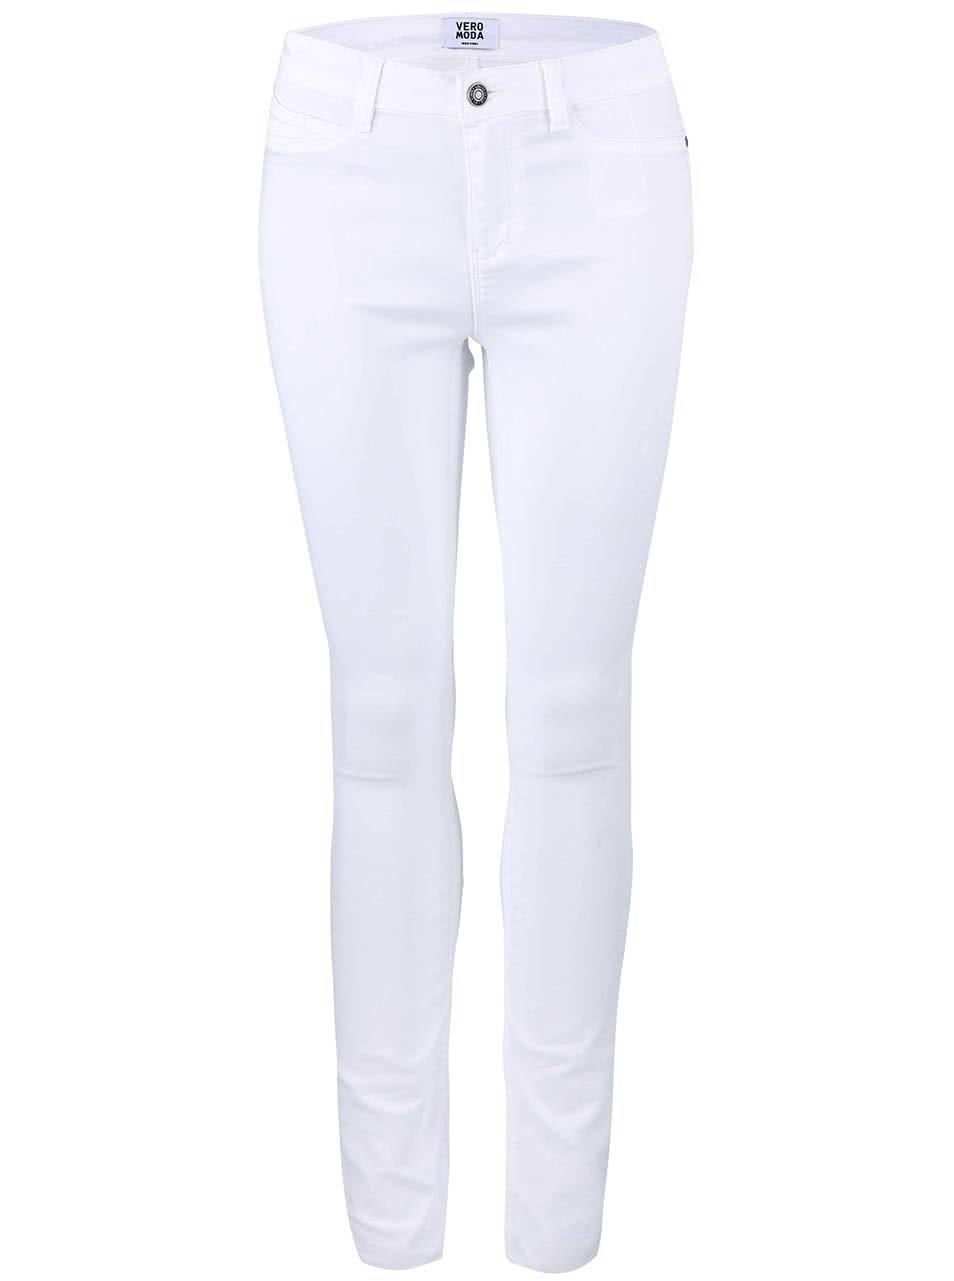 Bílé elastické džíny VERO MODAy Flex ... c13e5b501a